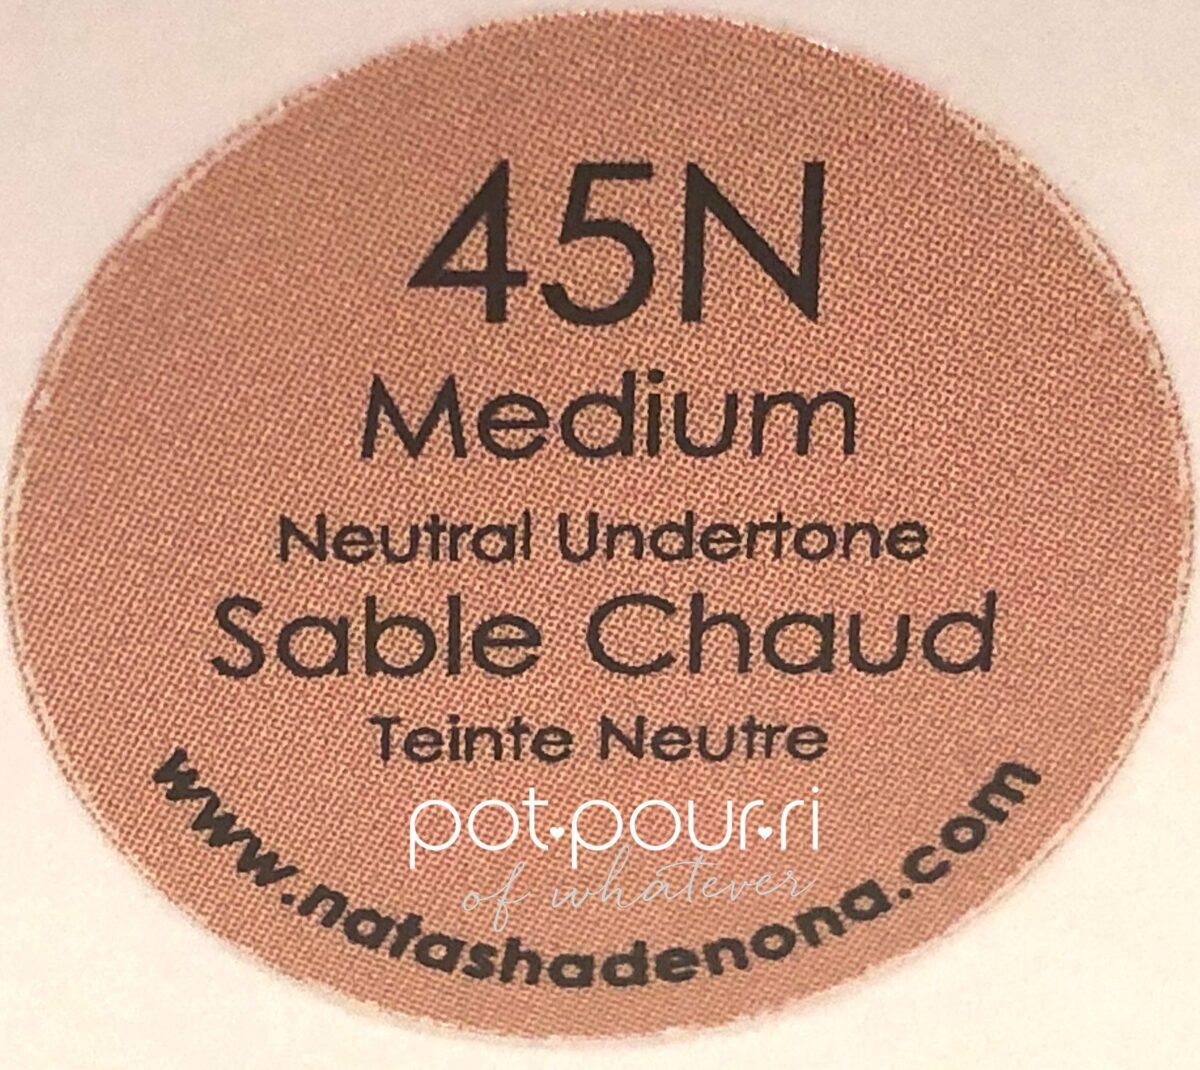 45N IS A MEDIUM SHADE THAT HAS NEUTRAL UNDERTONES